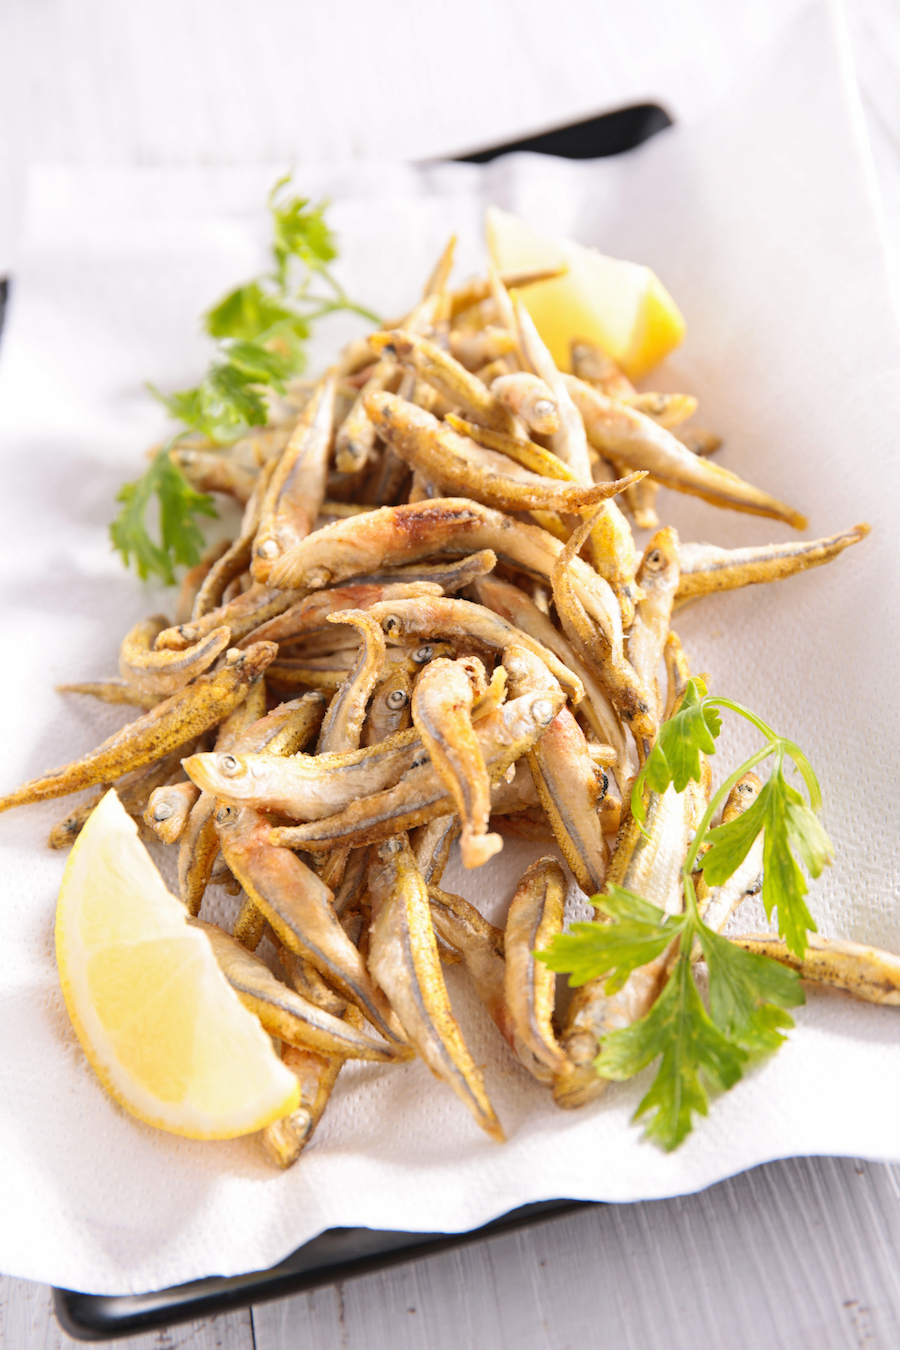 gefrituurde kleine visjes